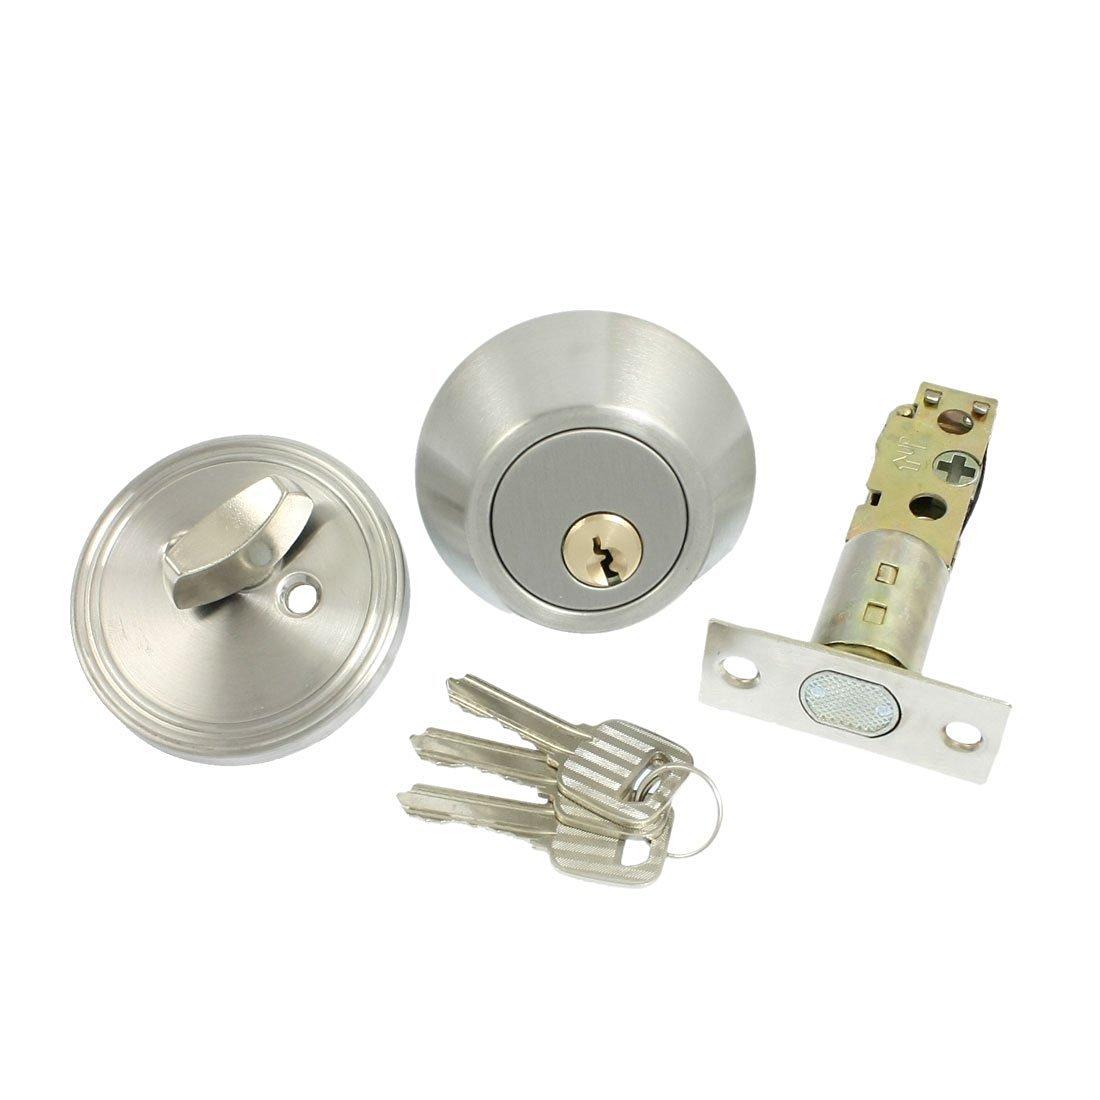 TOOGOO(R) Home Door Locking Security Single Cylinder Deadbolt Lock Silver Tone